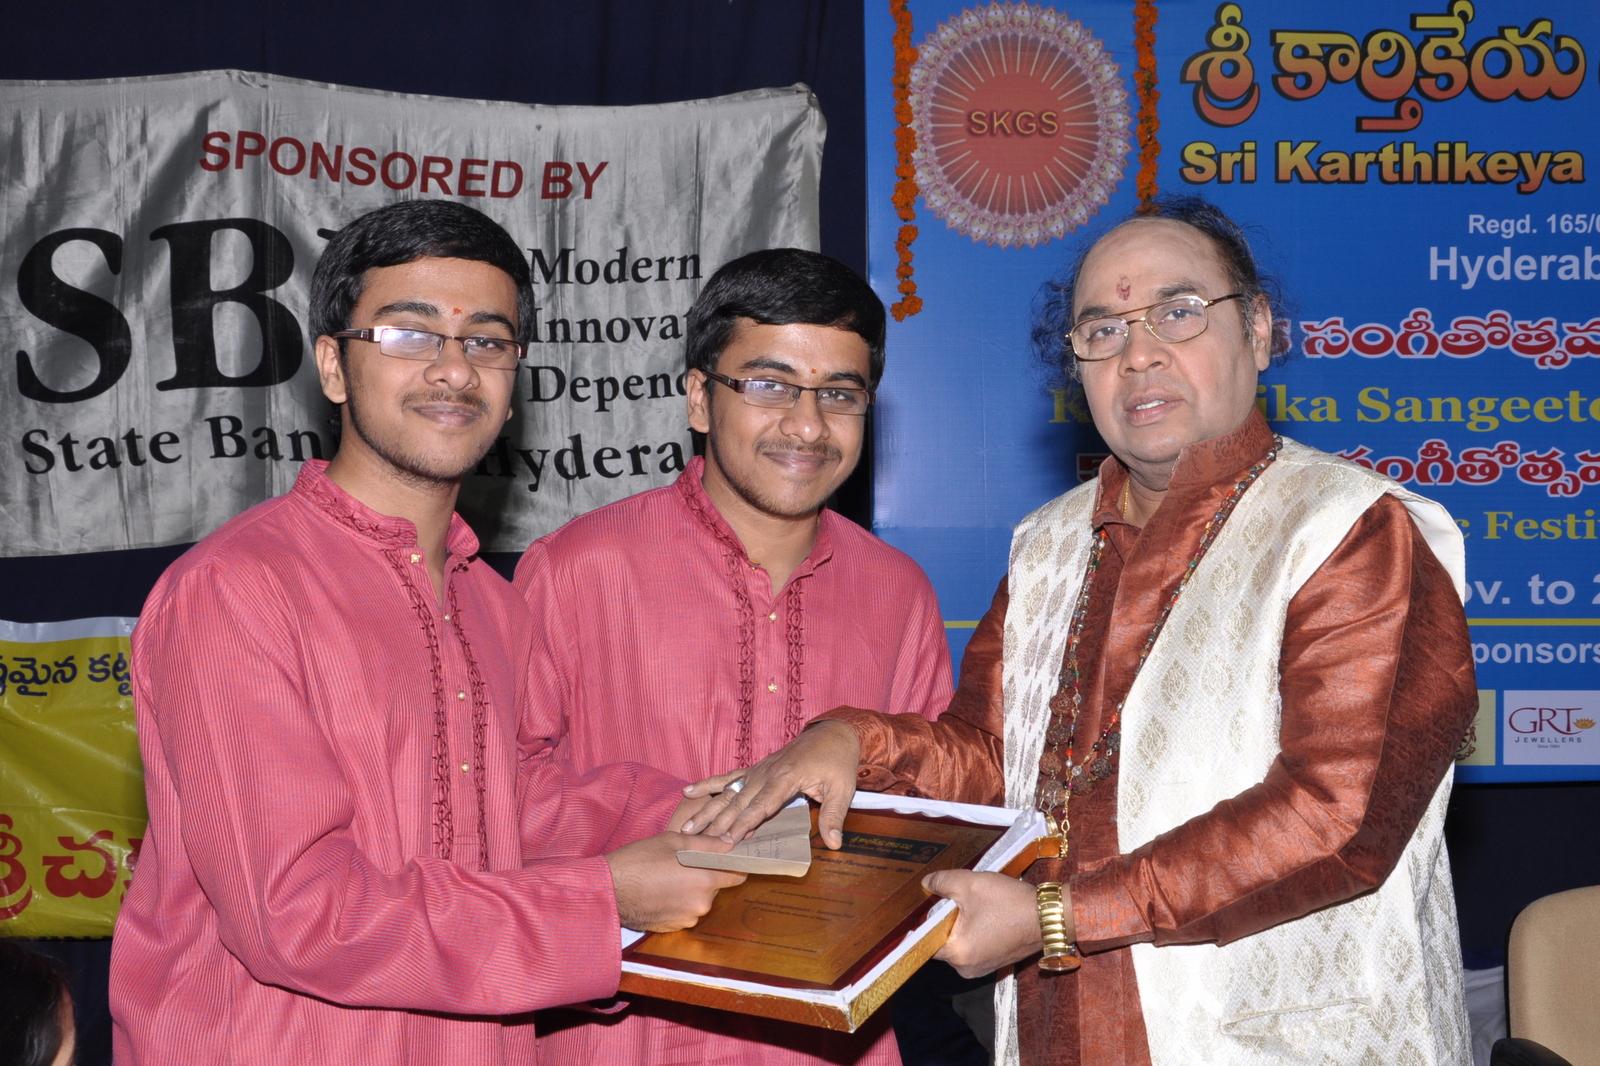 Yuva Pratibha Puraskaram 2014 awarded to Sri Ambale Heramba & Sri Ambale Hemantha . Award given by Mridangam Maestro Dr. Yella Venkateswara Rao